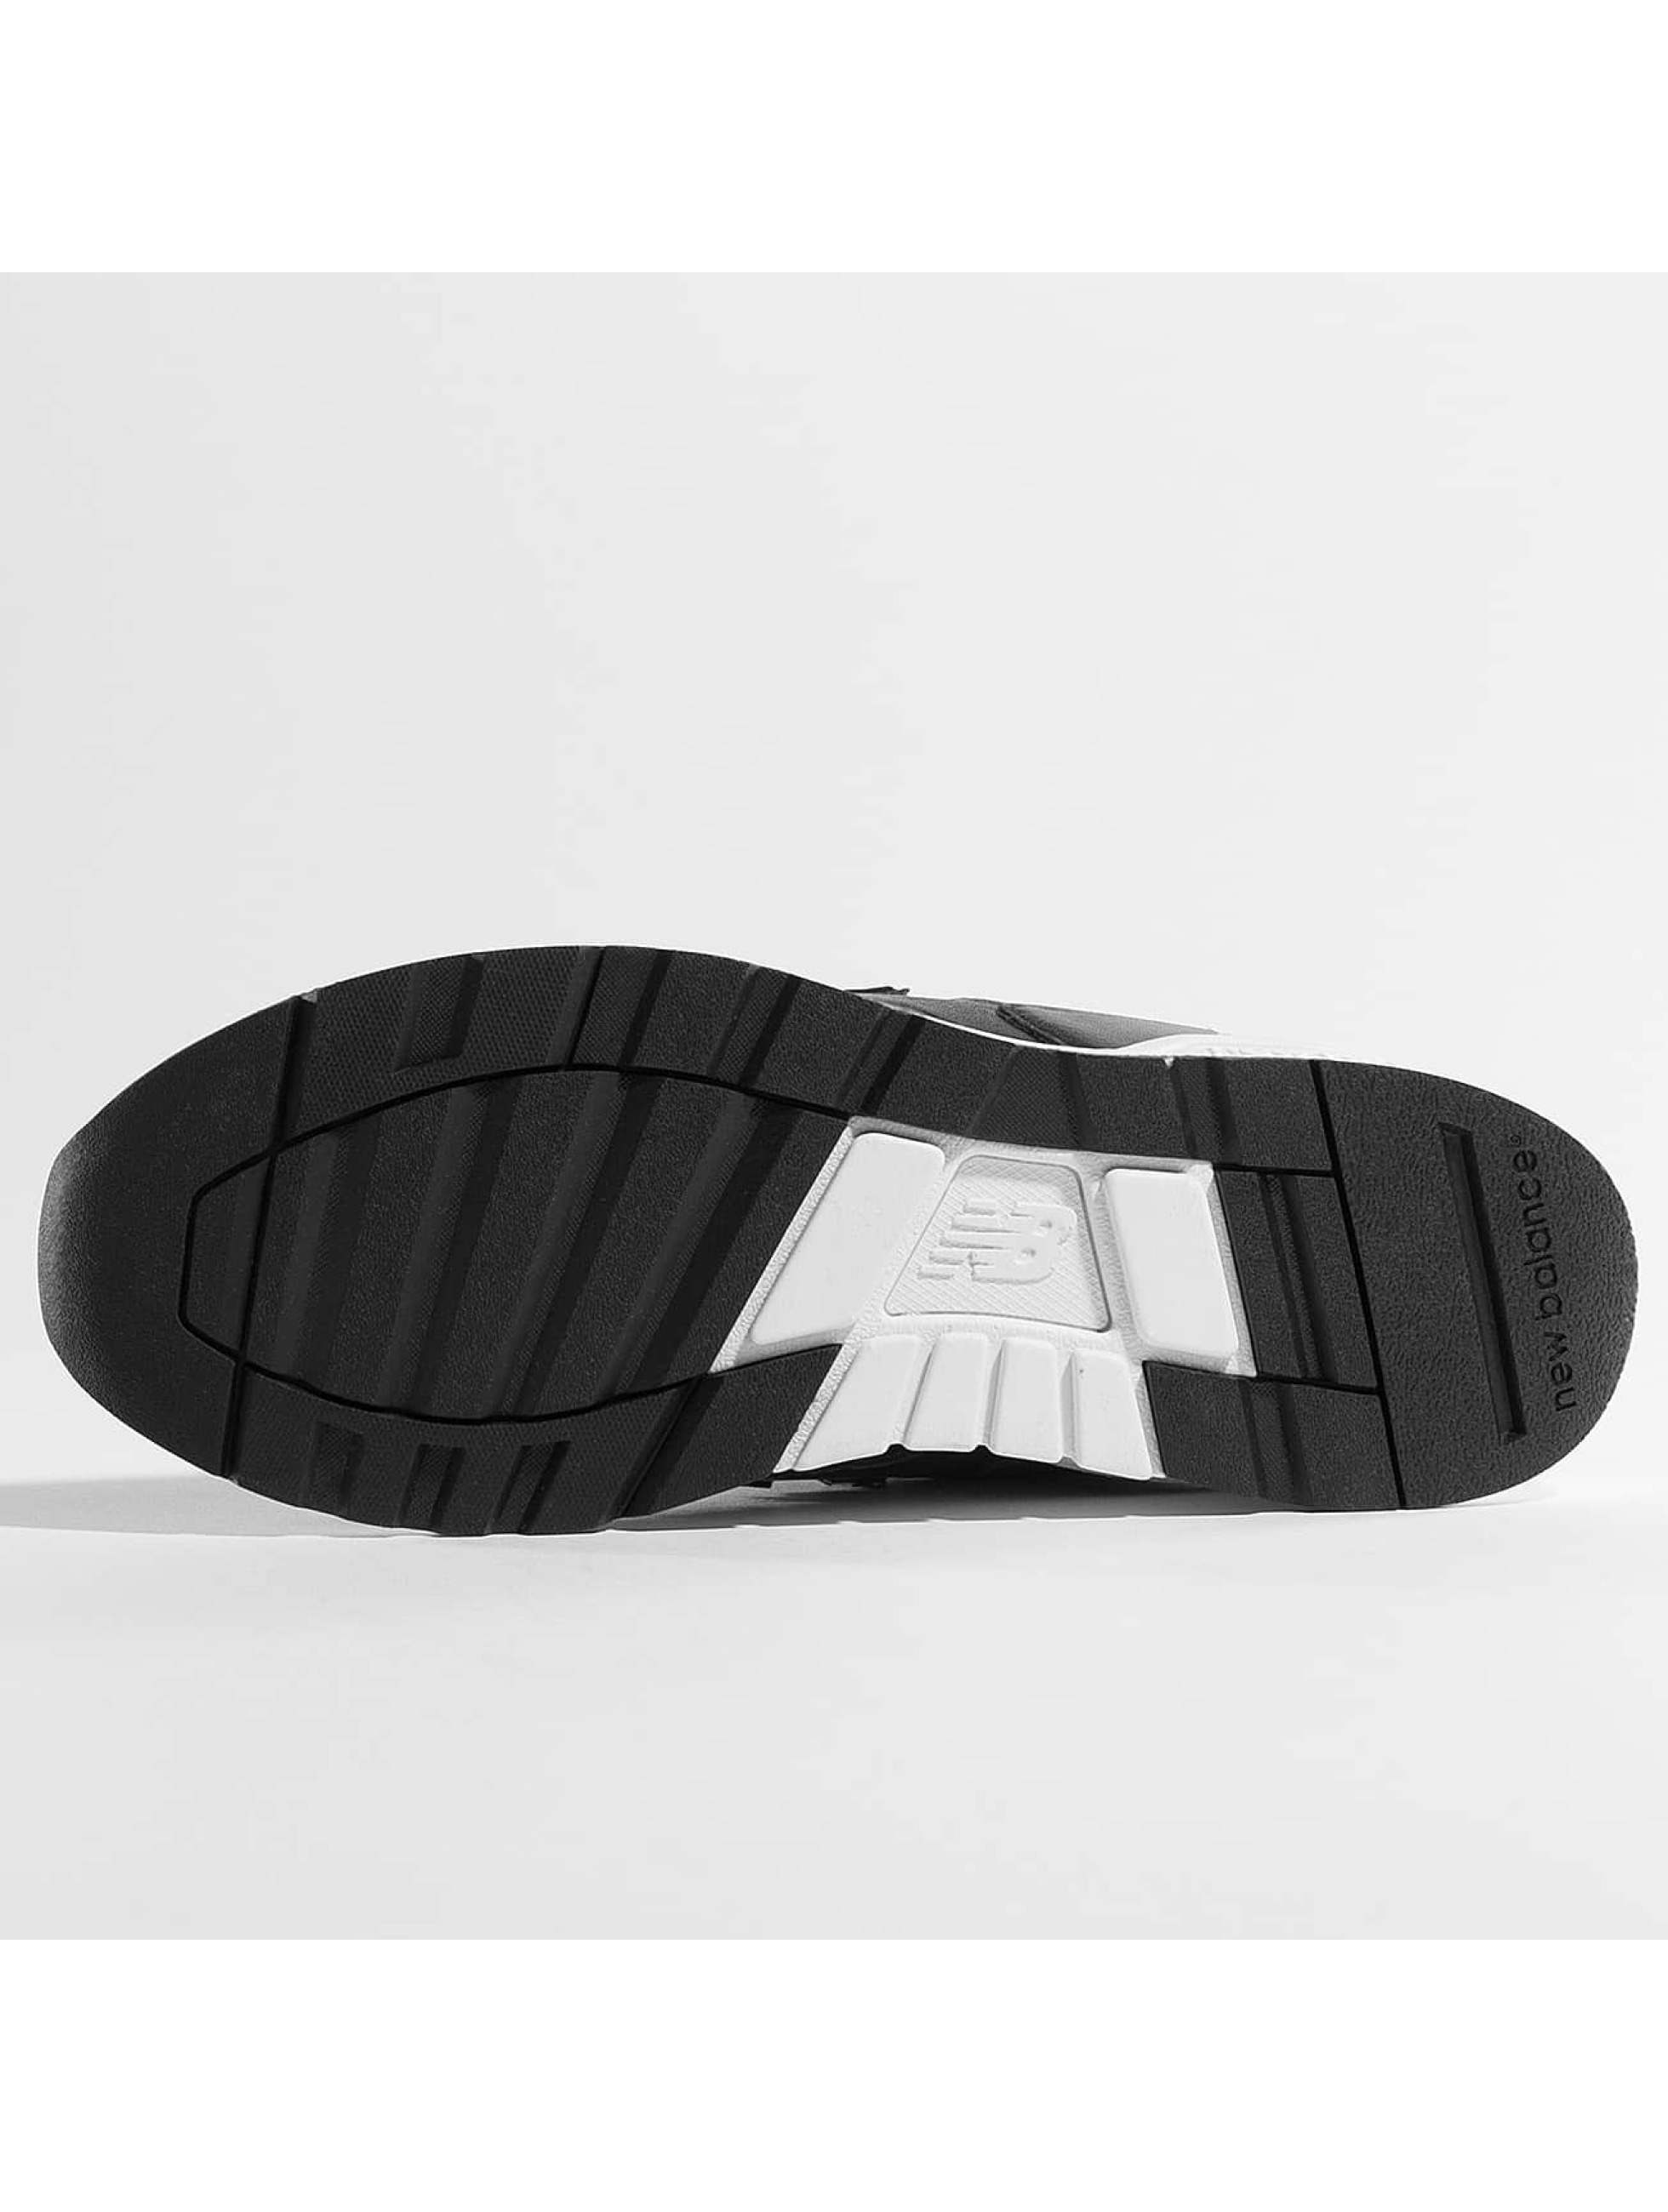 New Balance Sneakers ML 597 BLL black